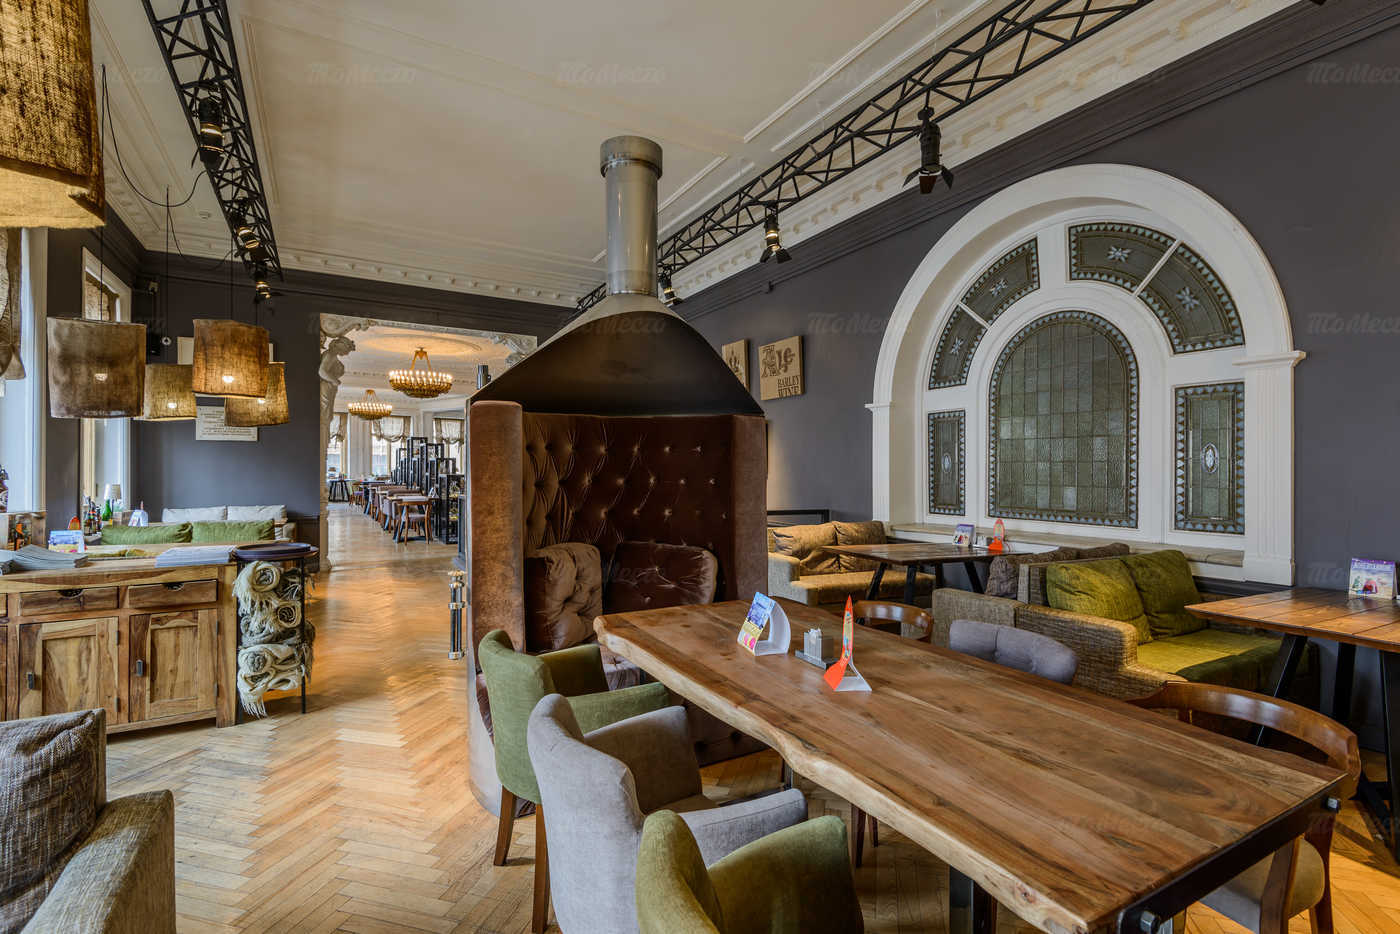 Ресторан Шато Винтаж (Chateau Vintage) на Невском проспекте фото 2